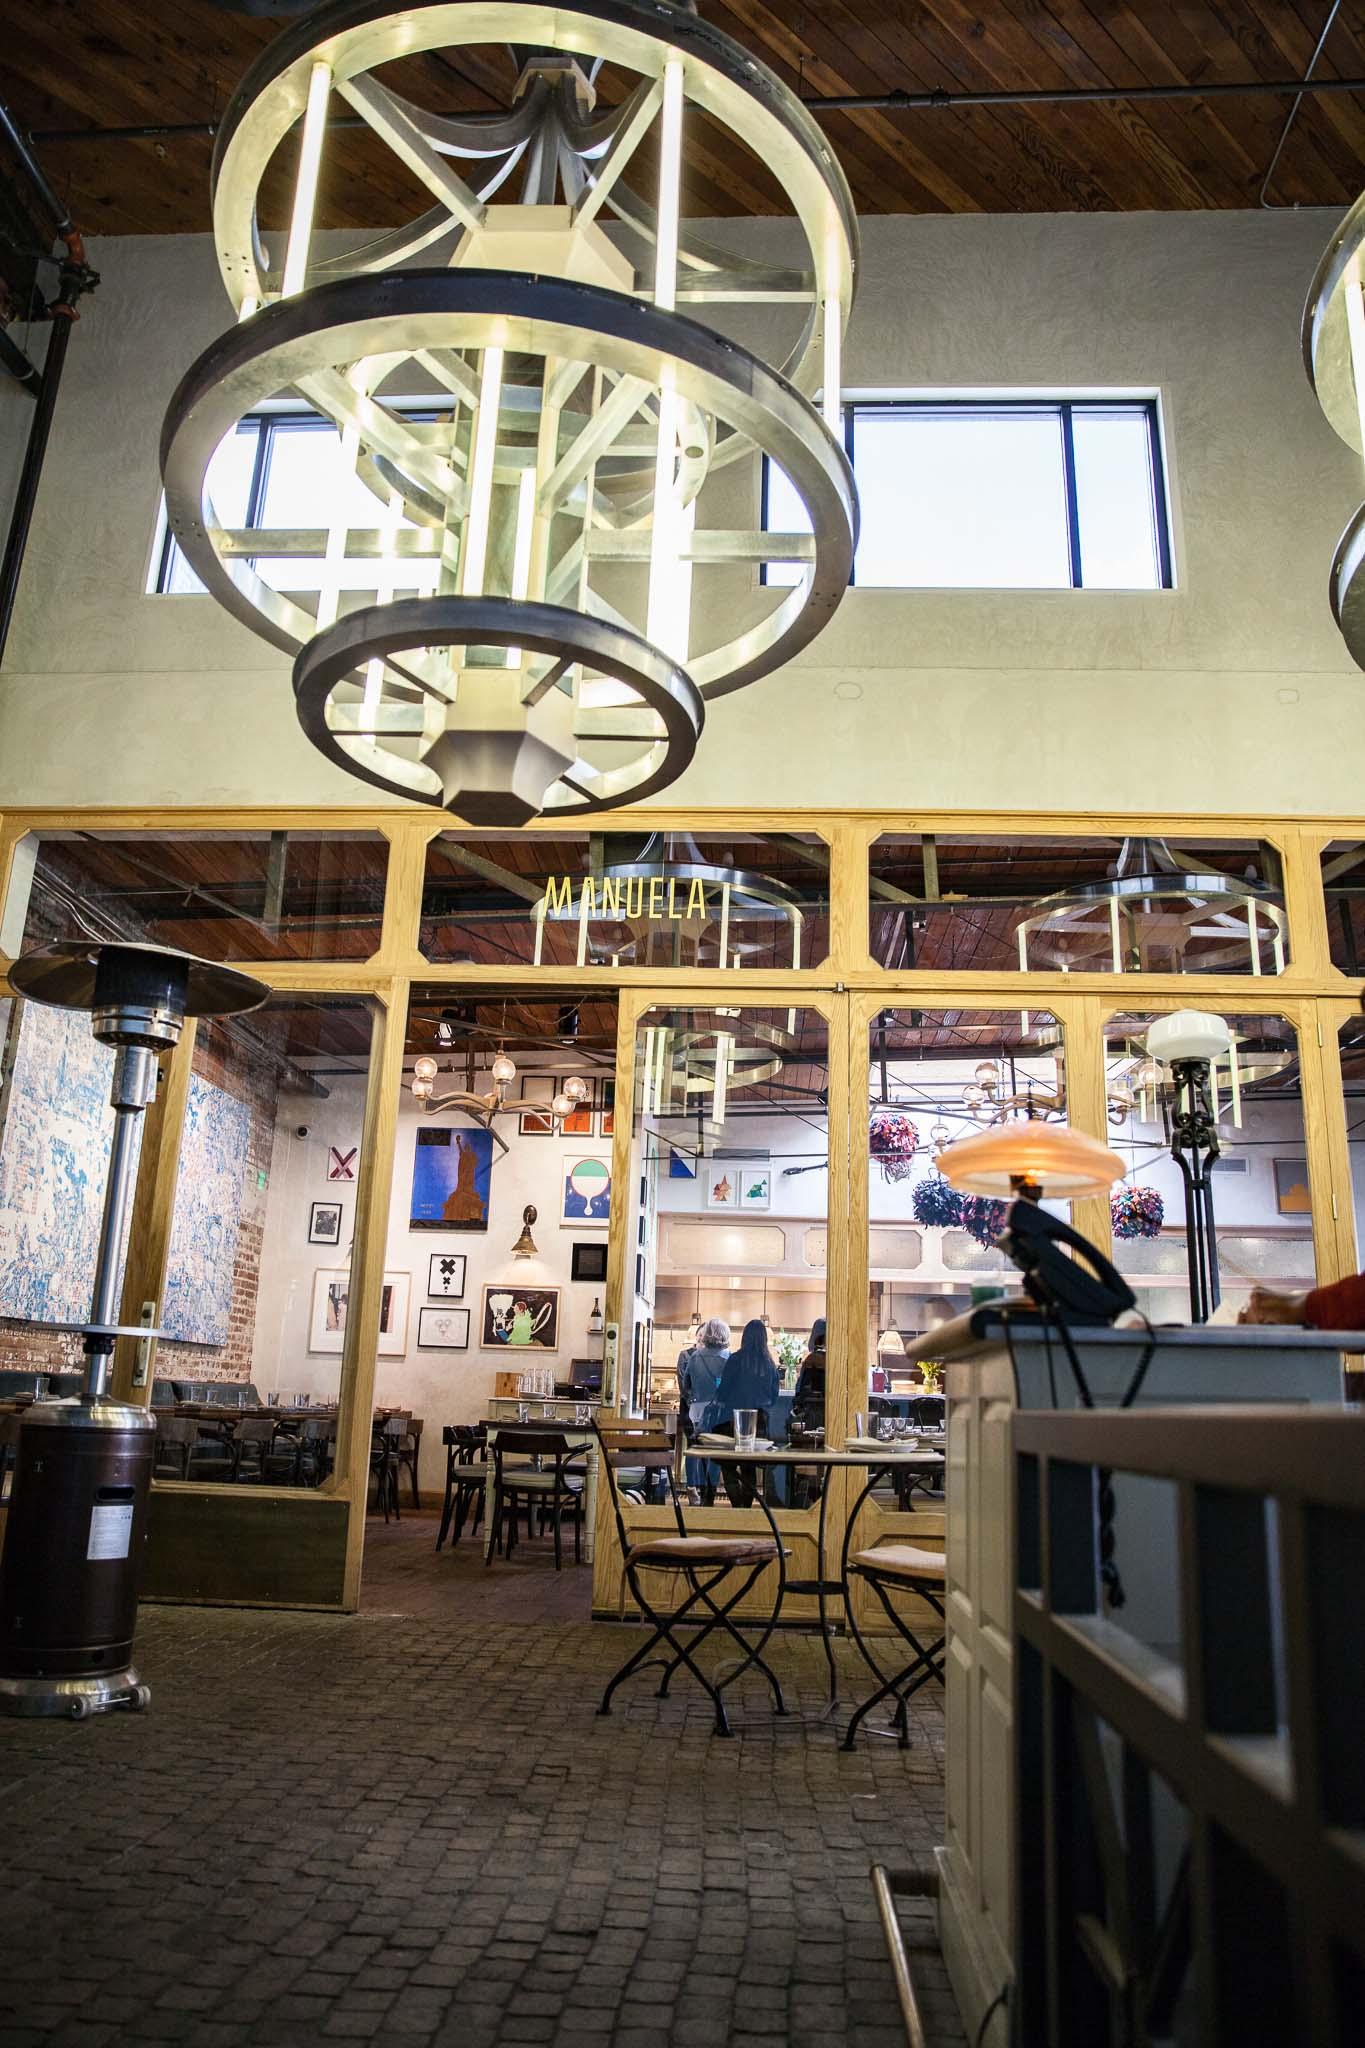 Los Angeles autrement découvrir Manuela restaurant à Hauser & Wirth